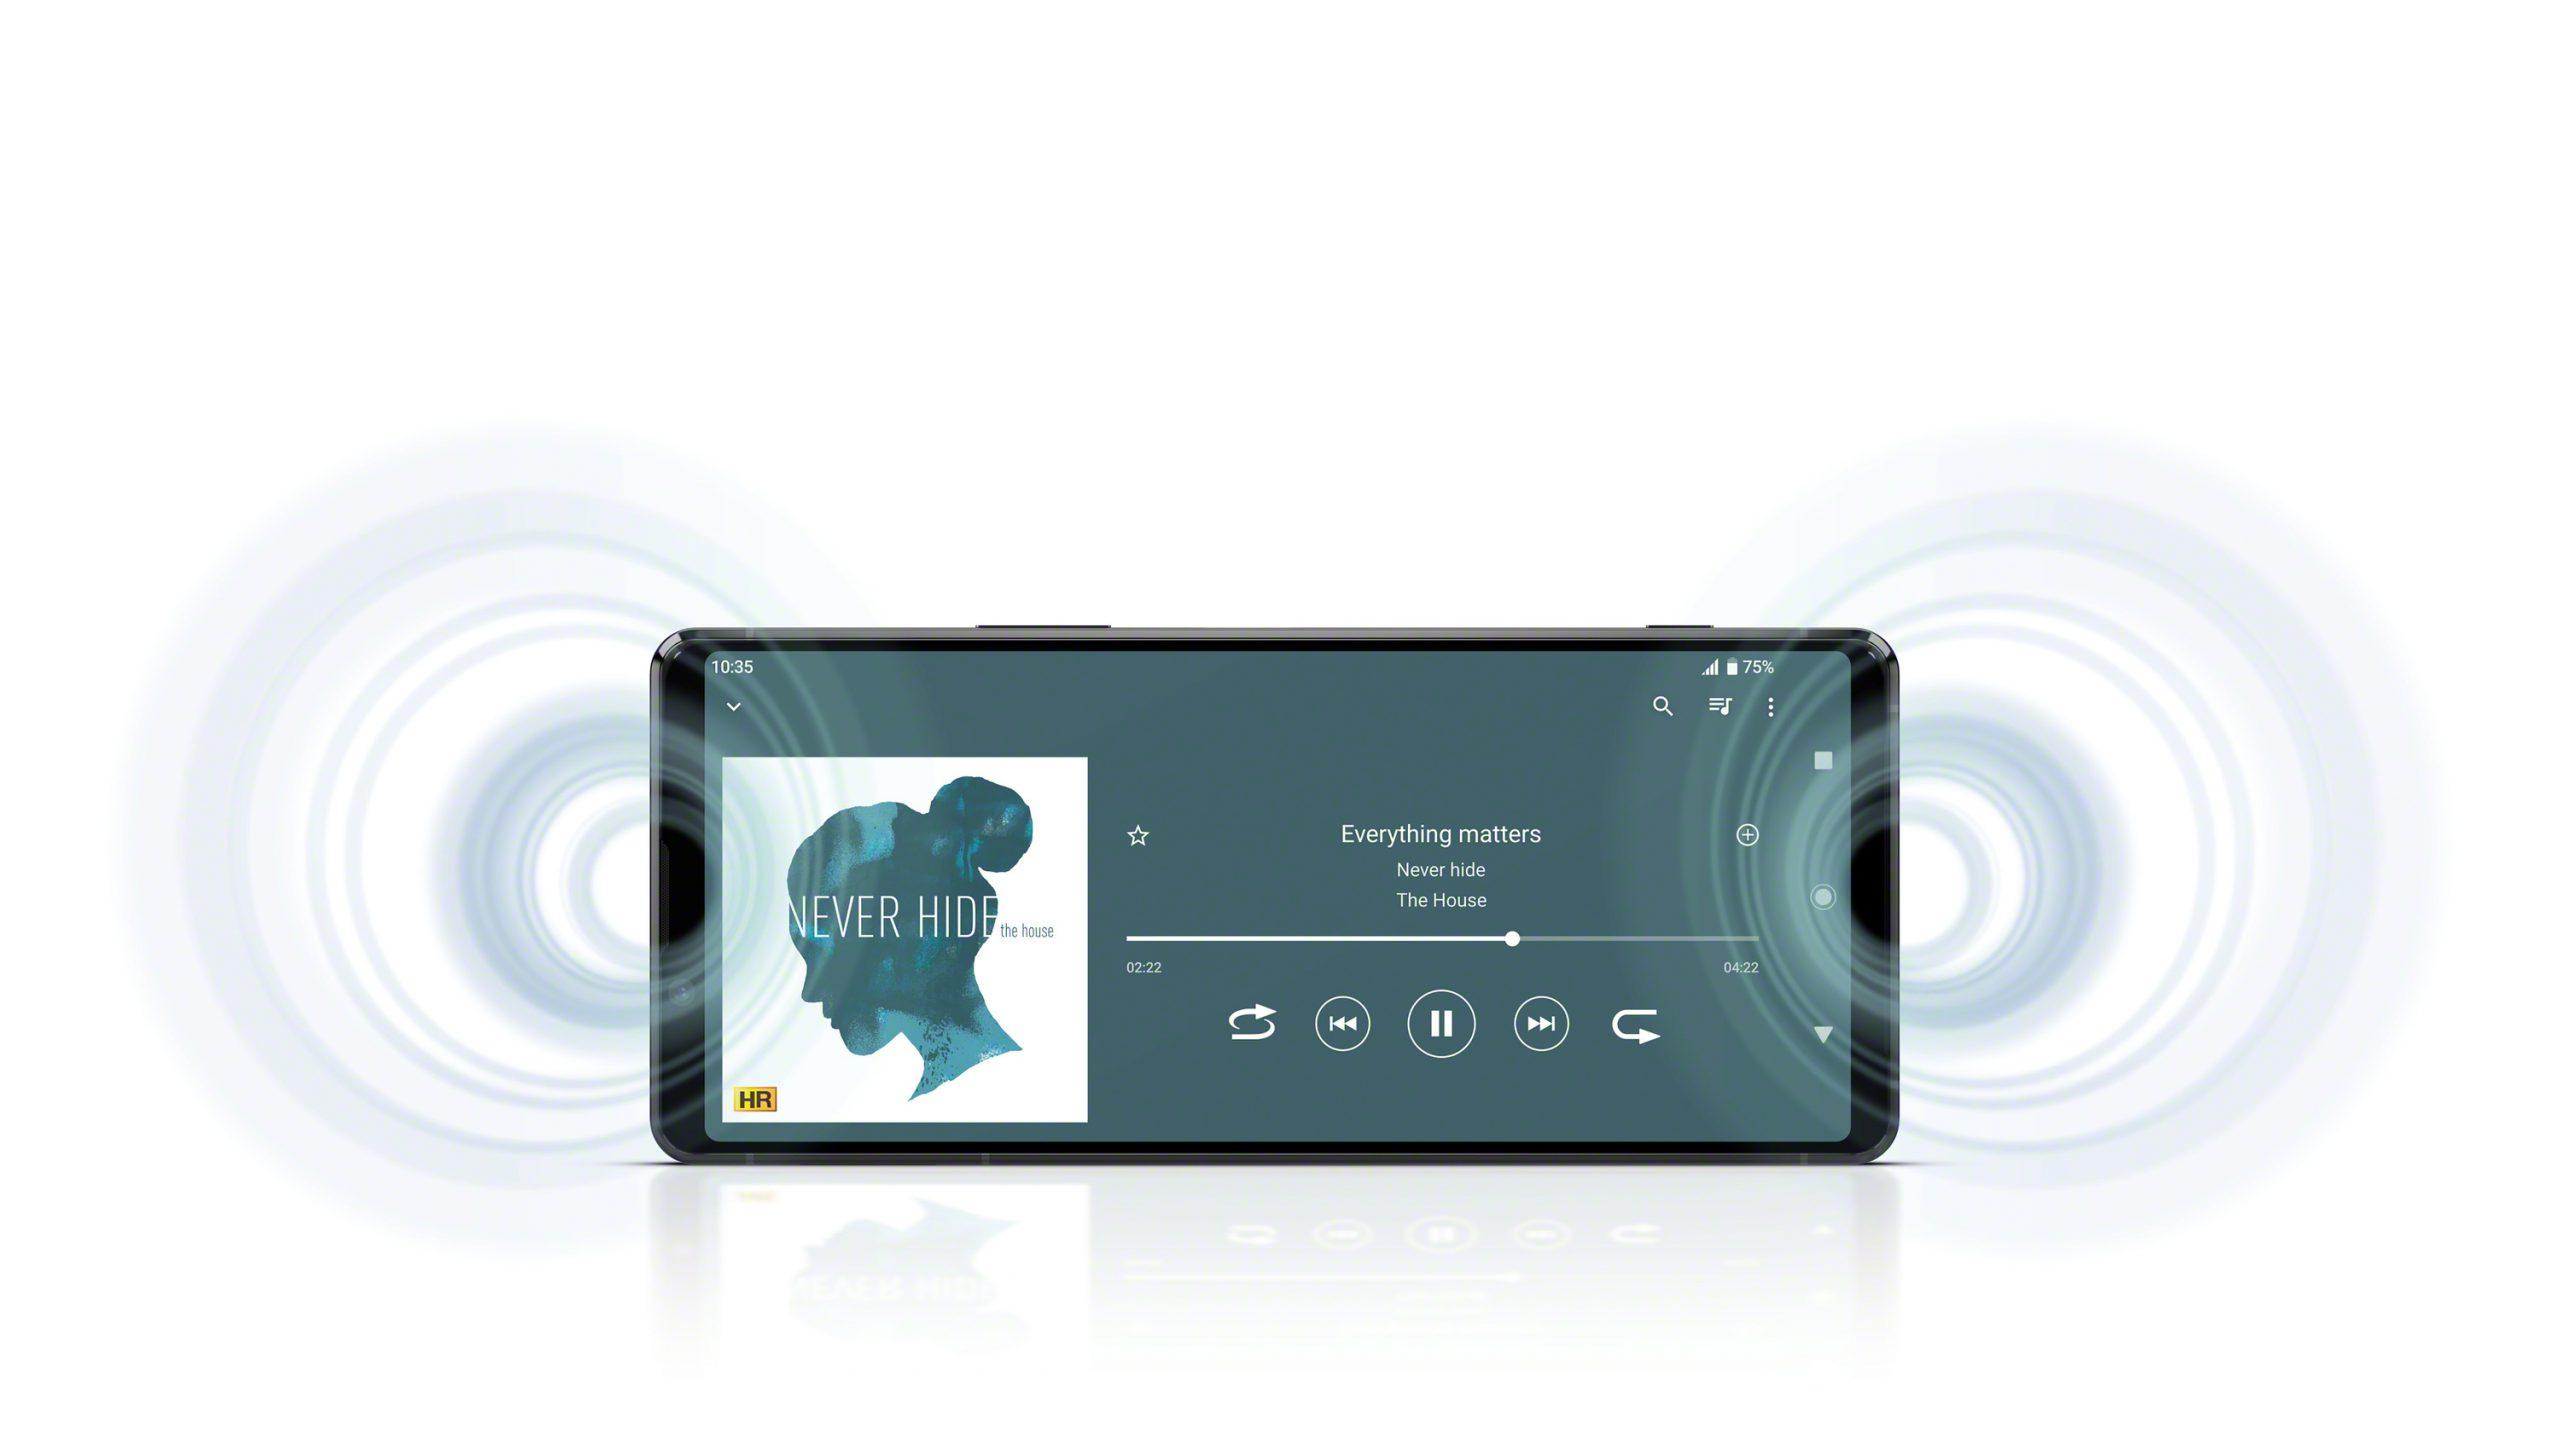 Xperia 1 II Front Stereo Speakers scaled - Sony Xperia 1 II